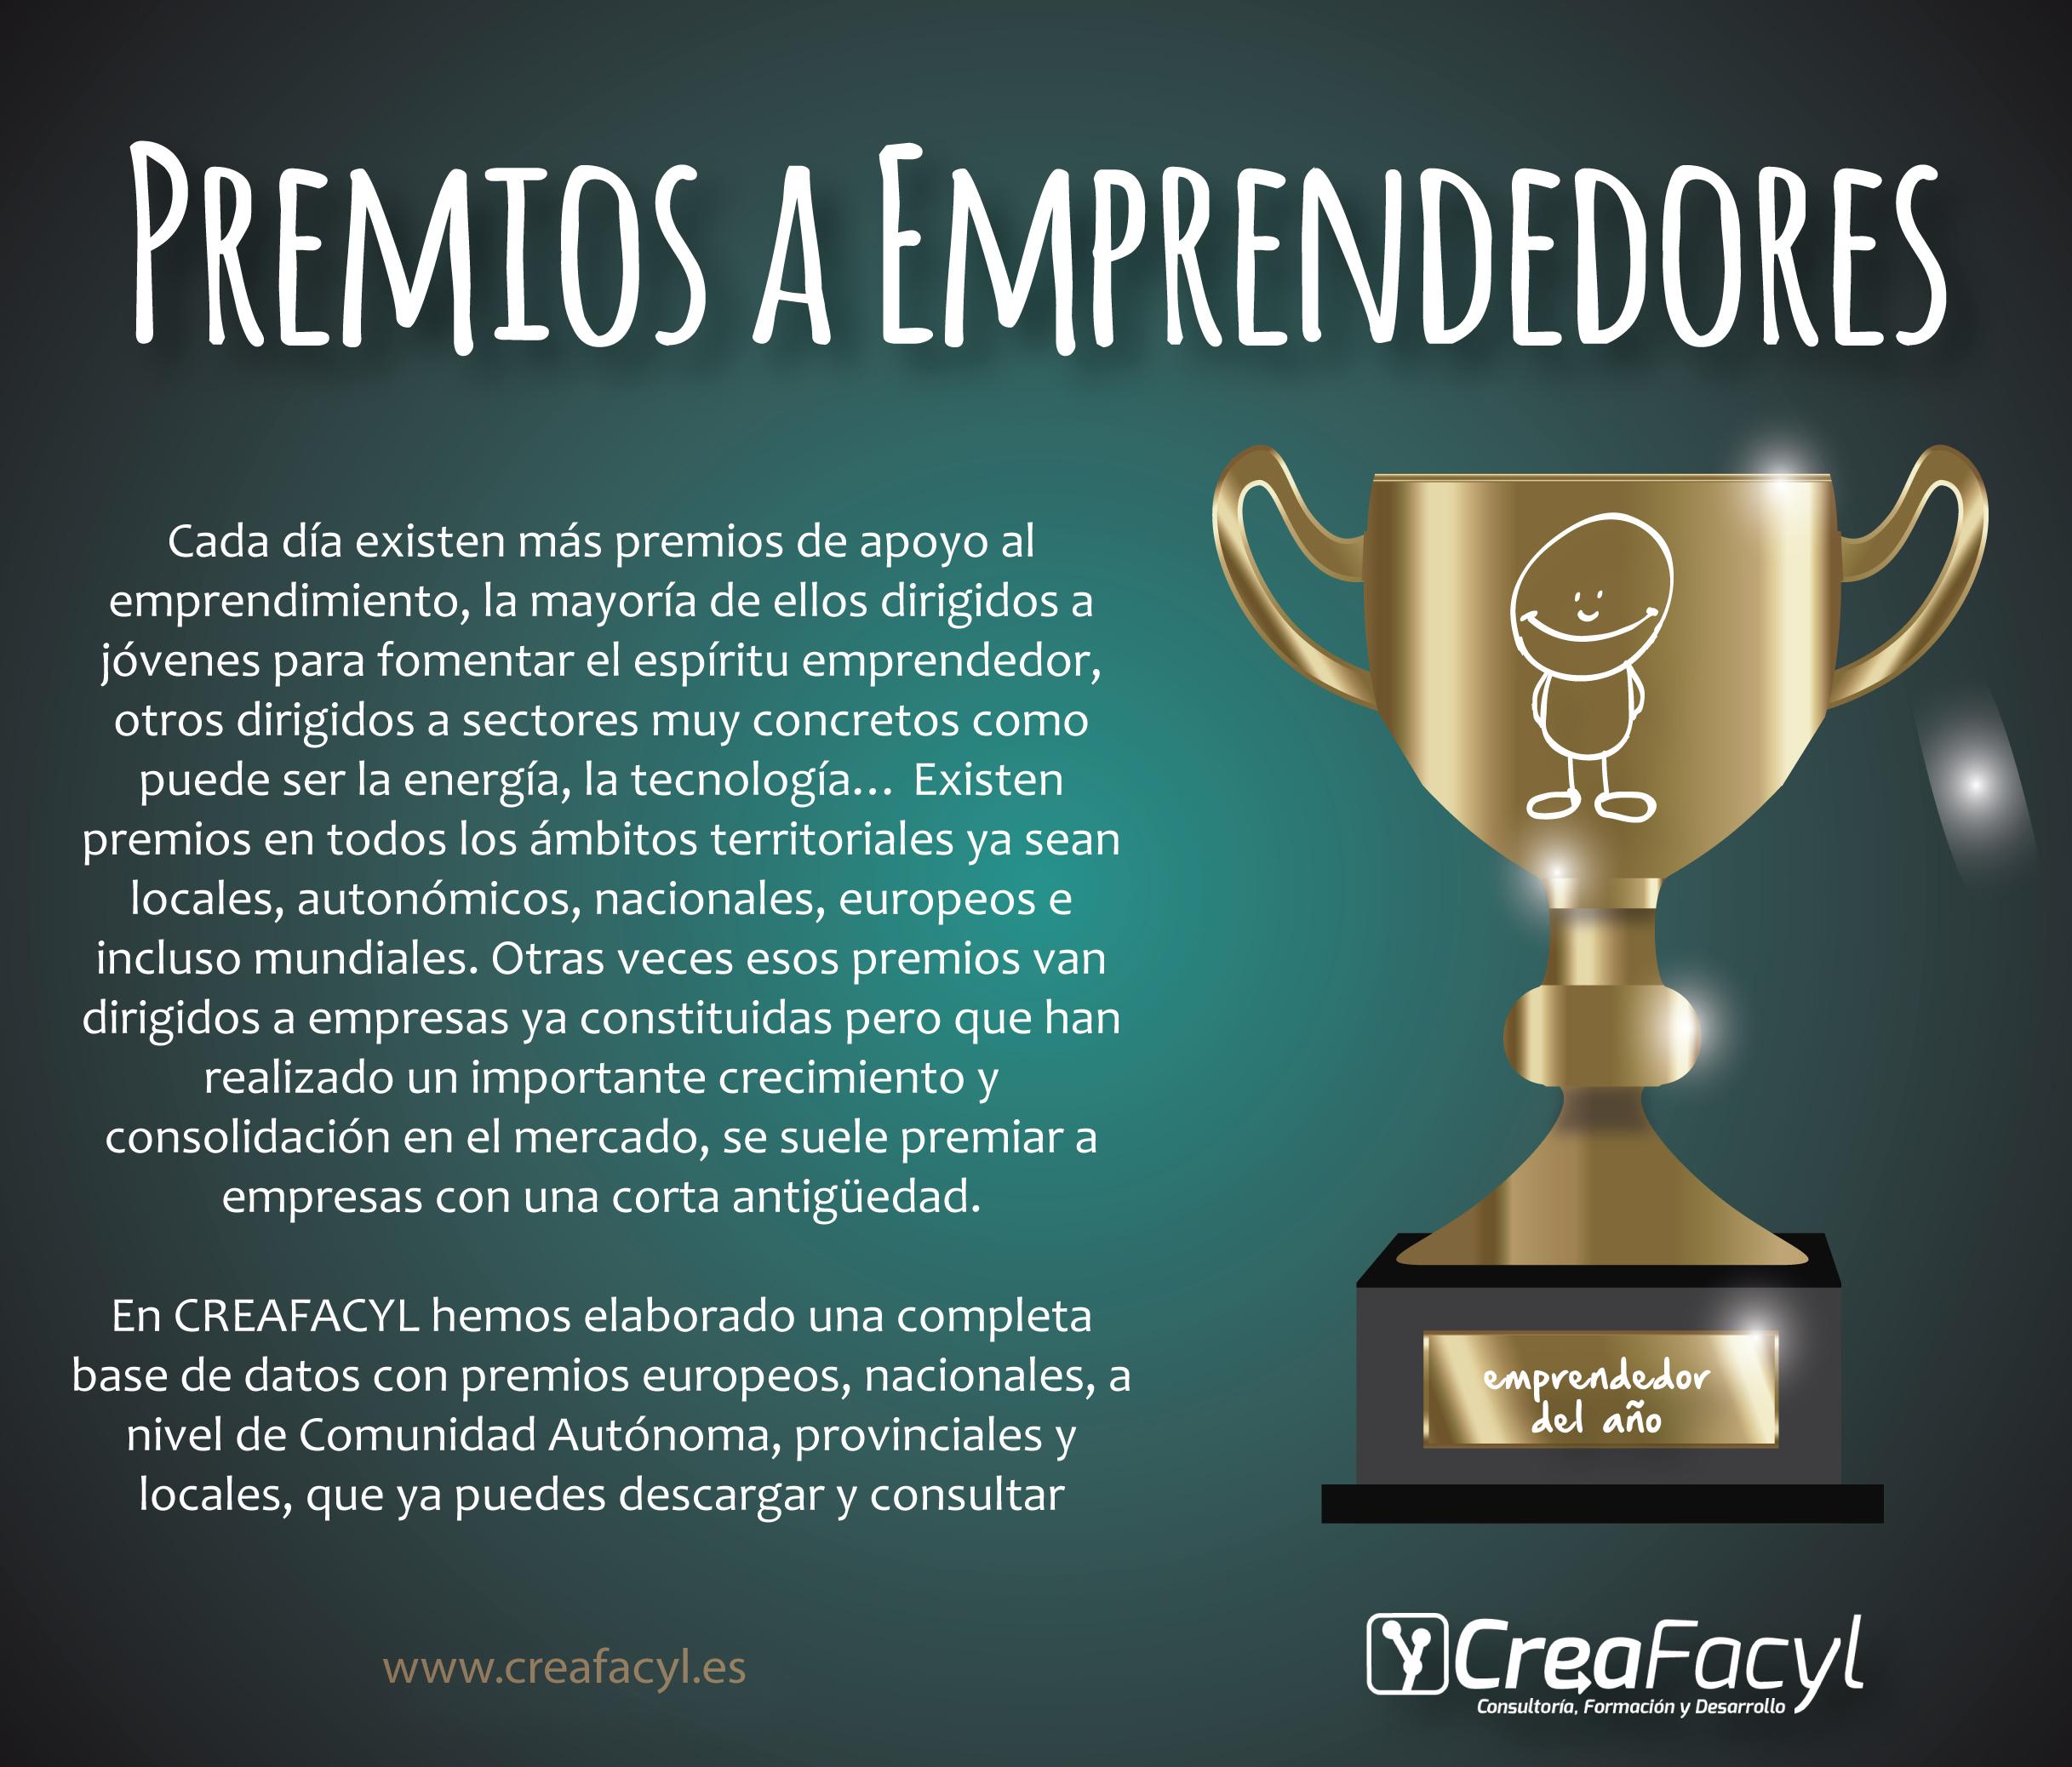 Premios emprendedores imagen Creafacyl